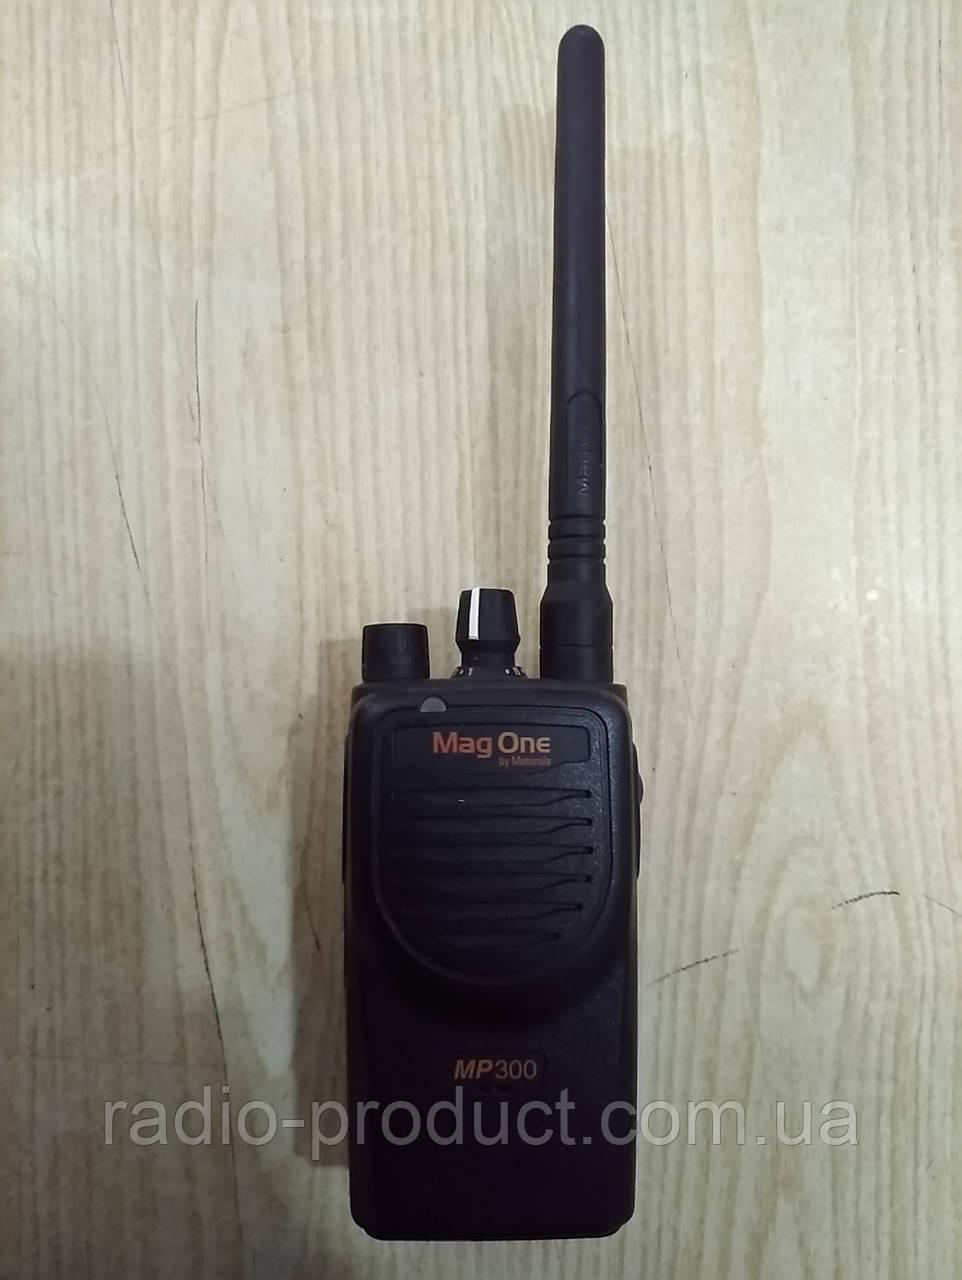 Motorola Mag One MP300 VHF, рация, радиостанция, б/у